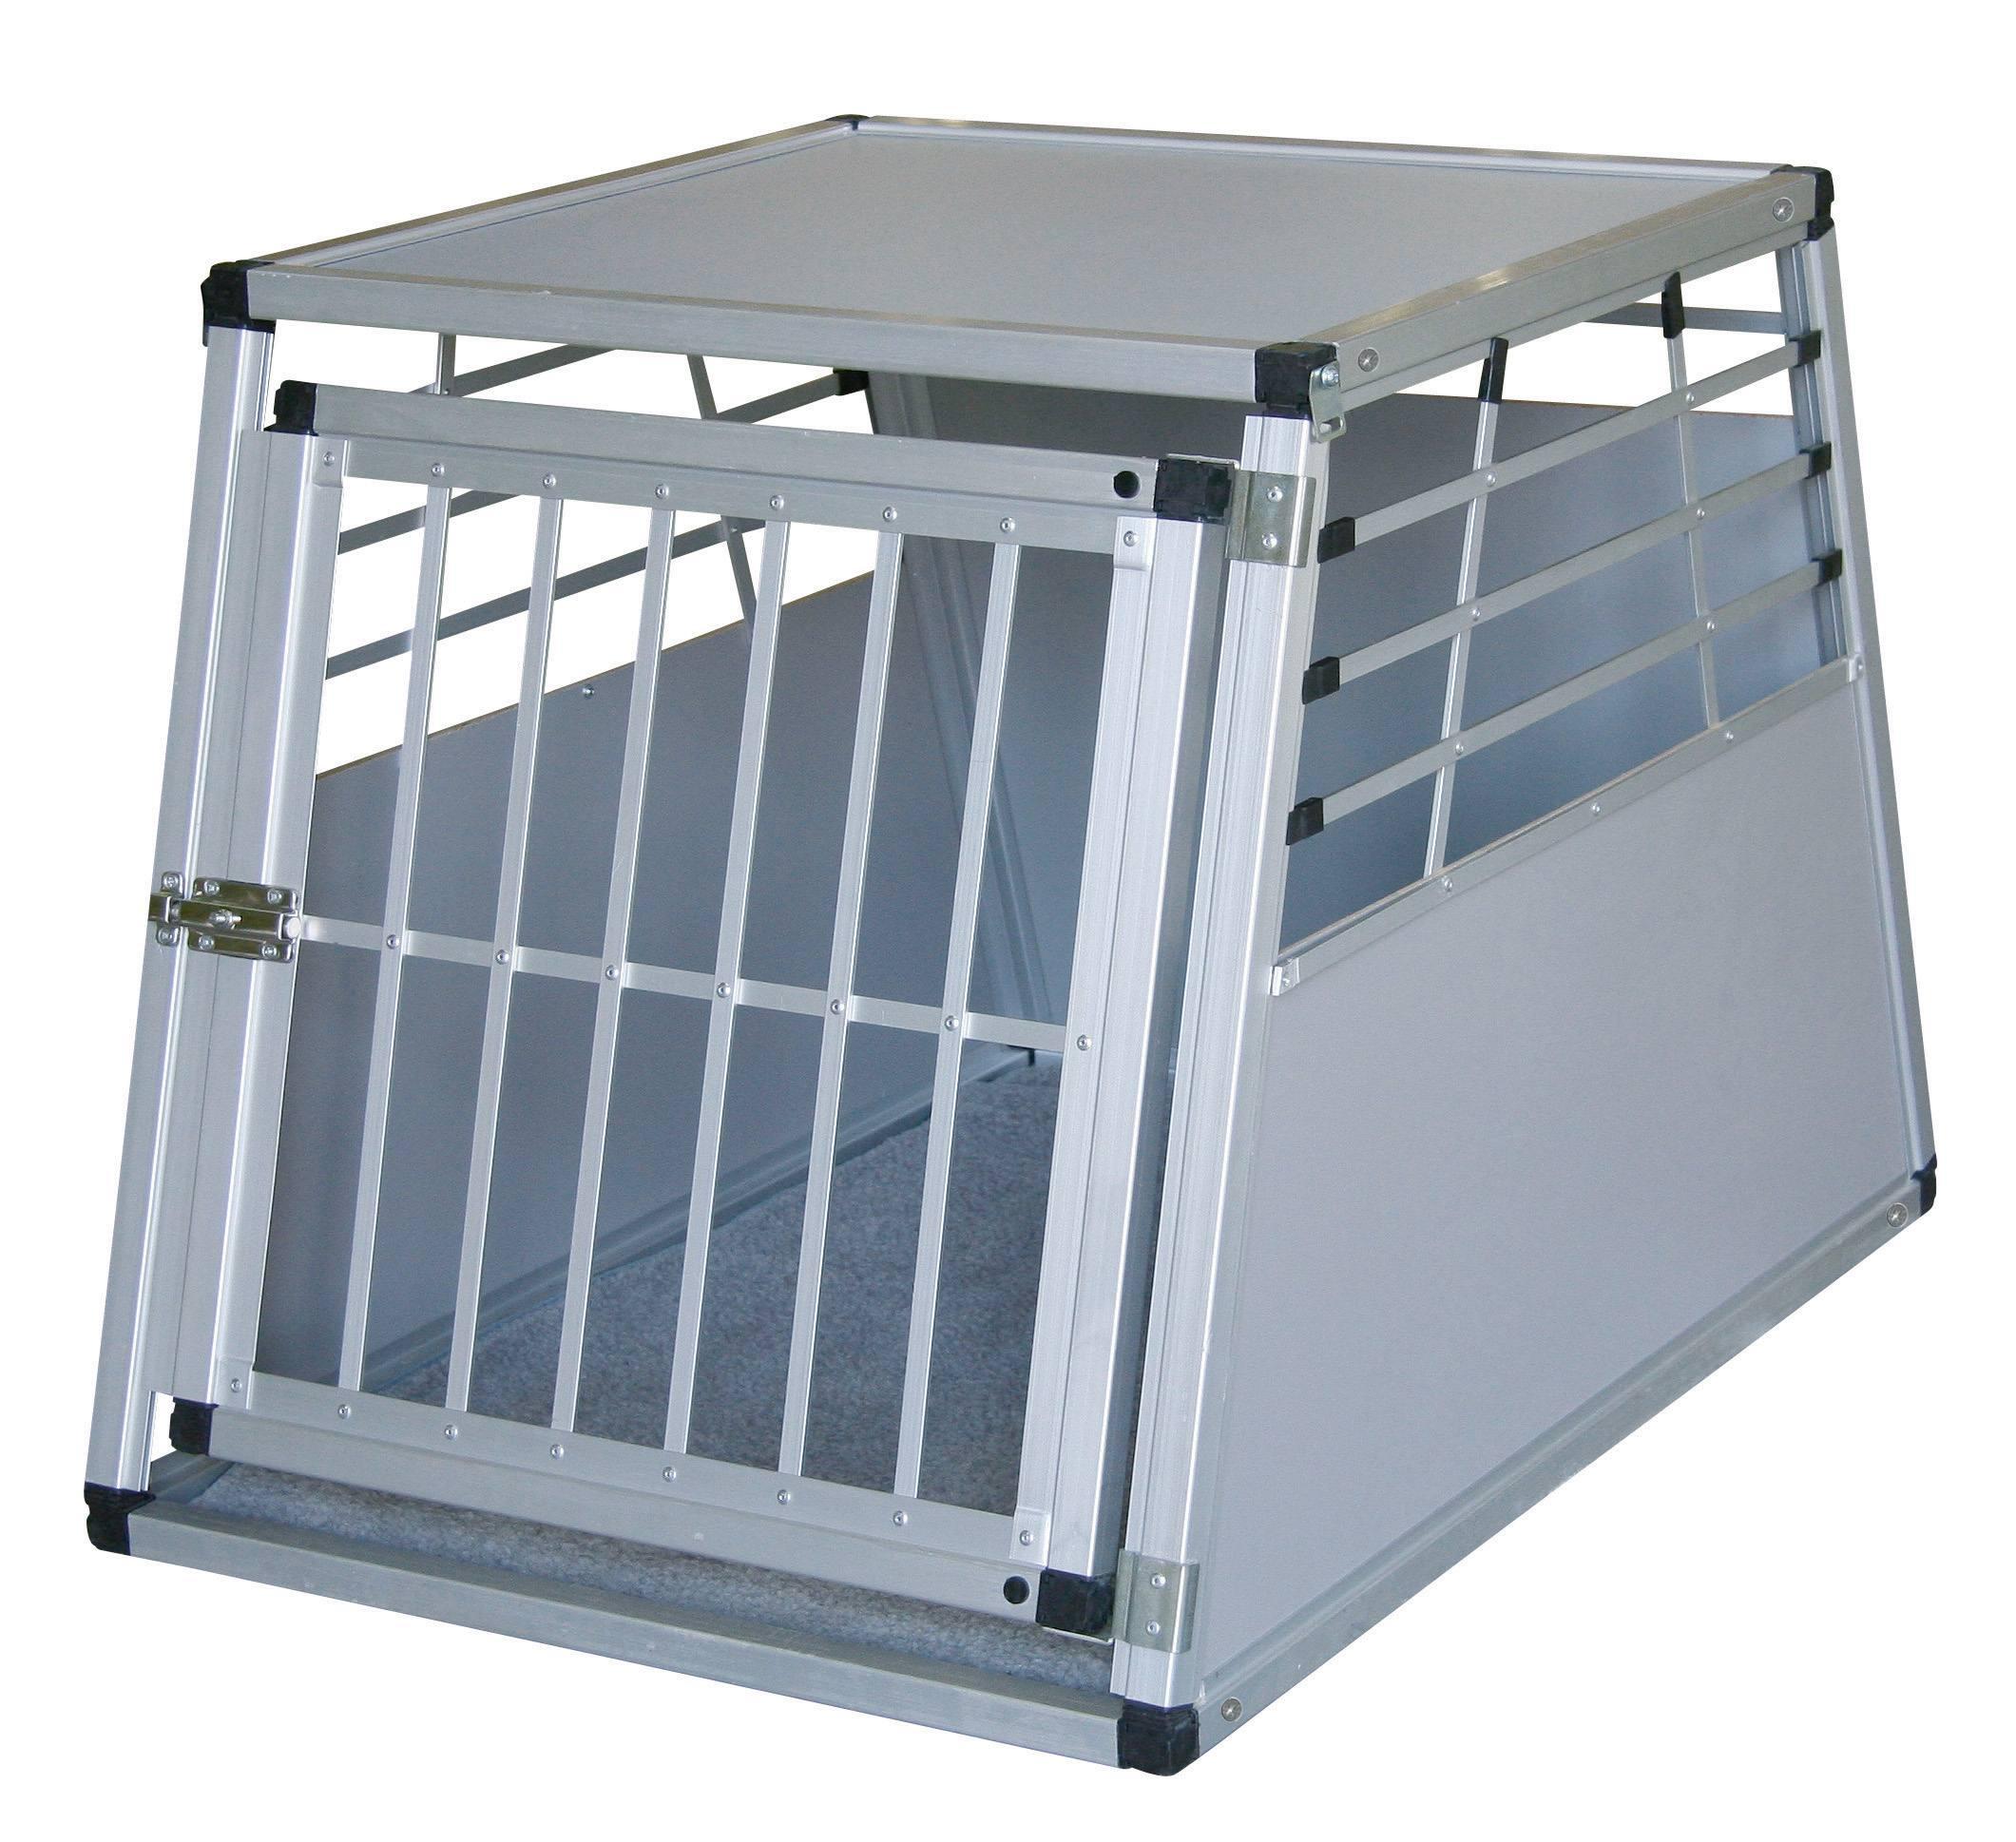 hunde transportbox 92 x 65 x 65 cm aus aluminium. Black Bedroom Furniture Sets. Home Design Ideas